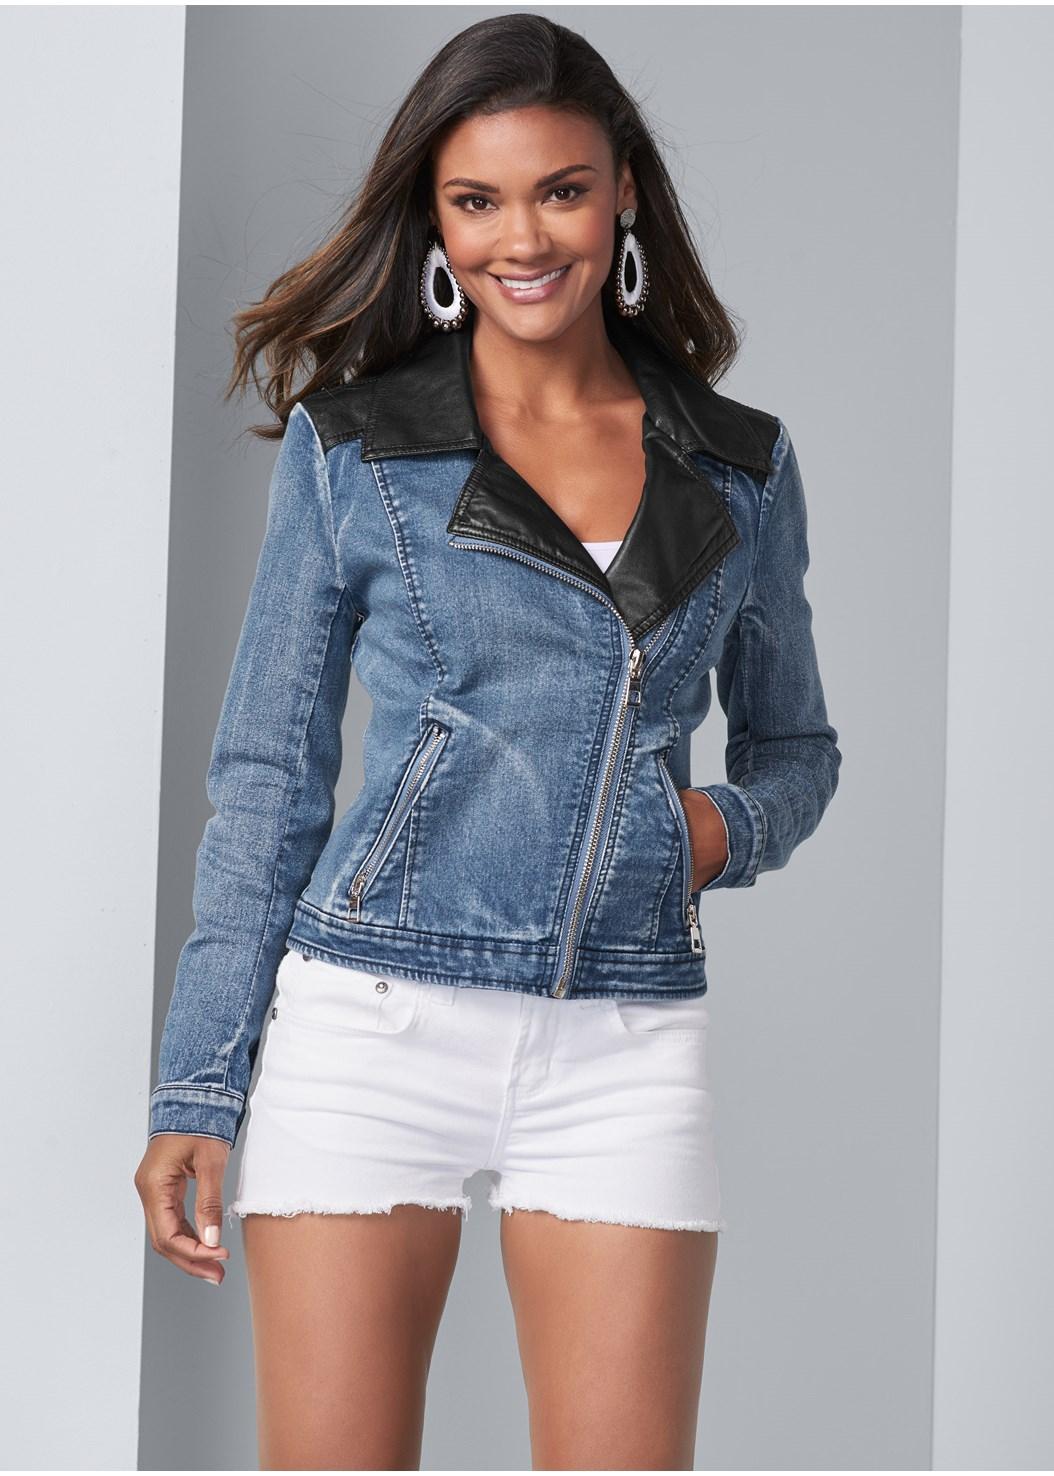 Mixed Media Moto Jacket,Basic Cami Two Pack,Frayed Cut Off Jean Shorts,Studded Belt Bag